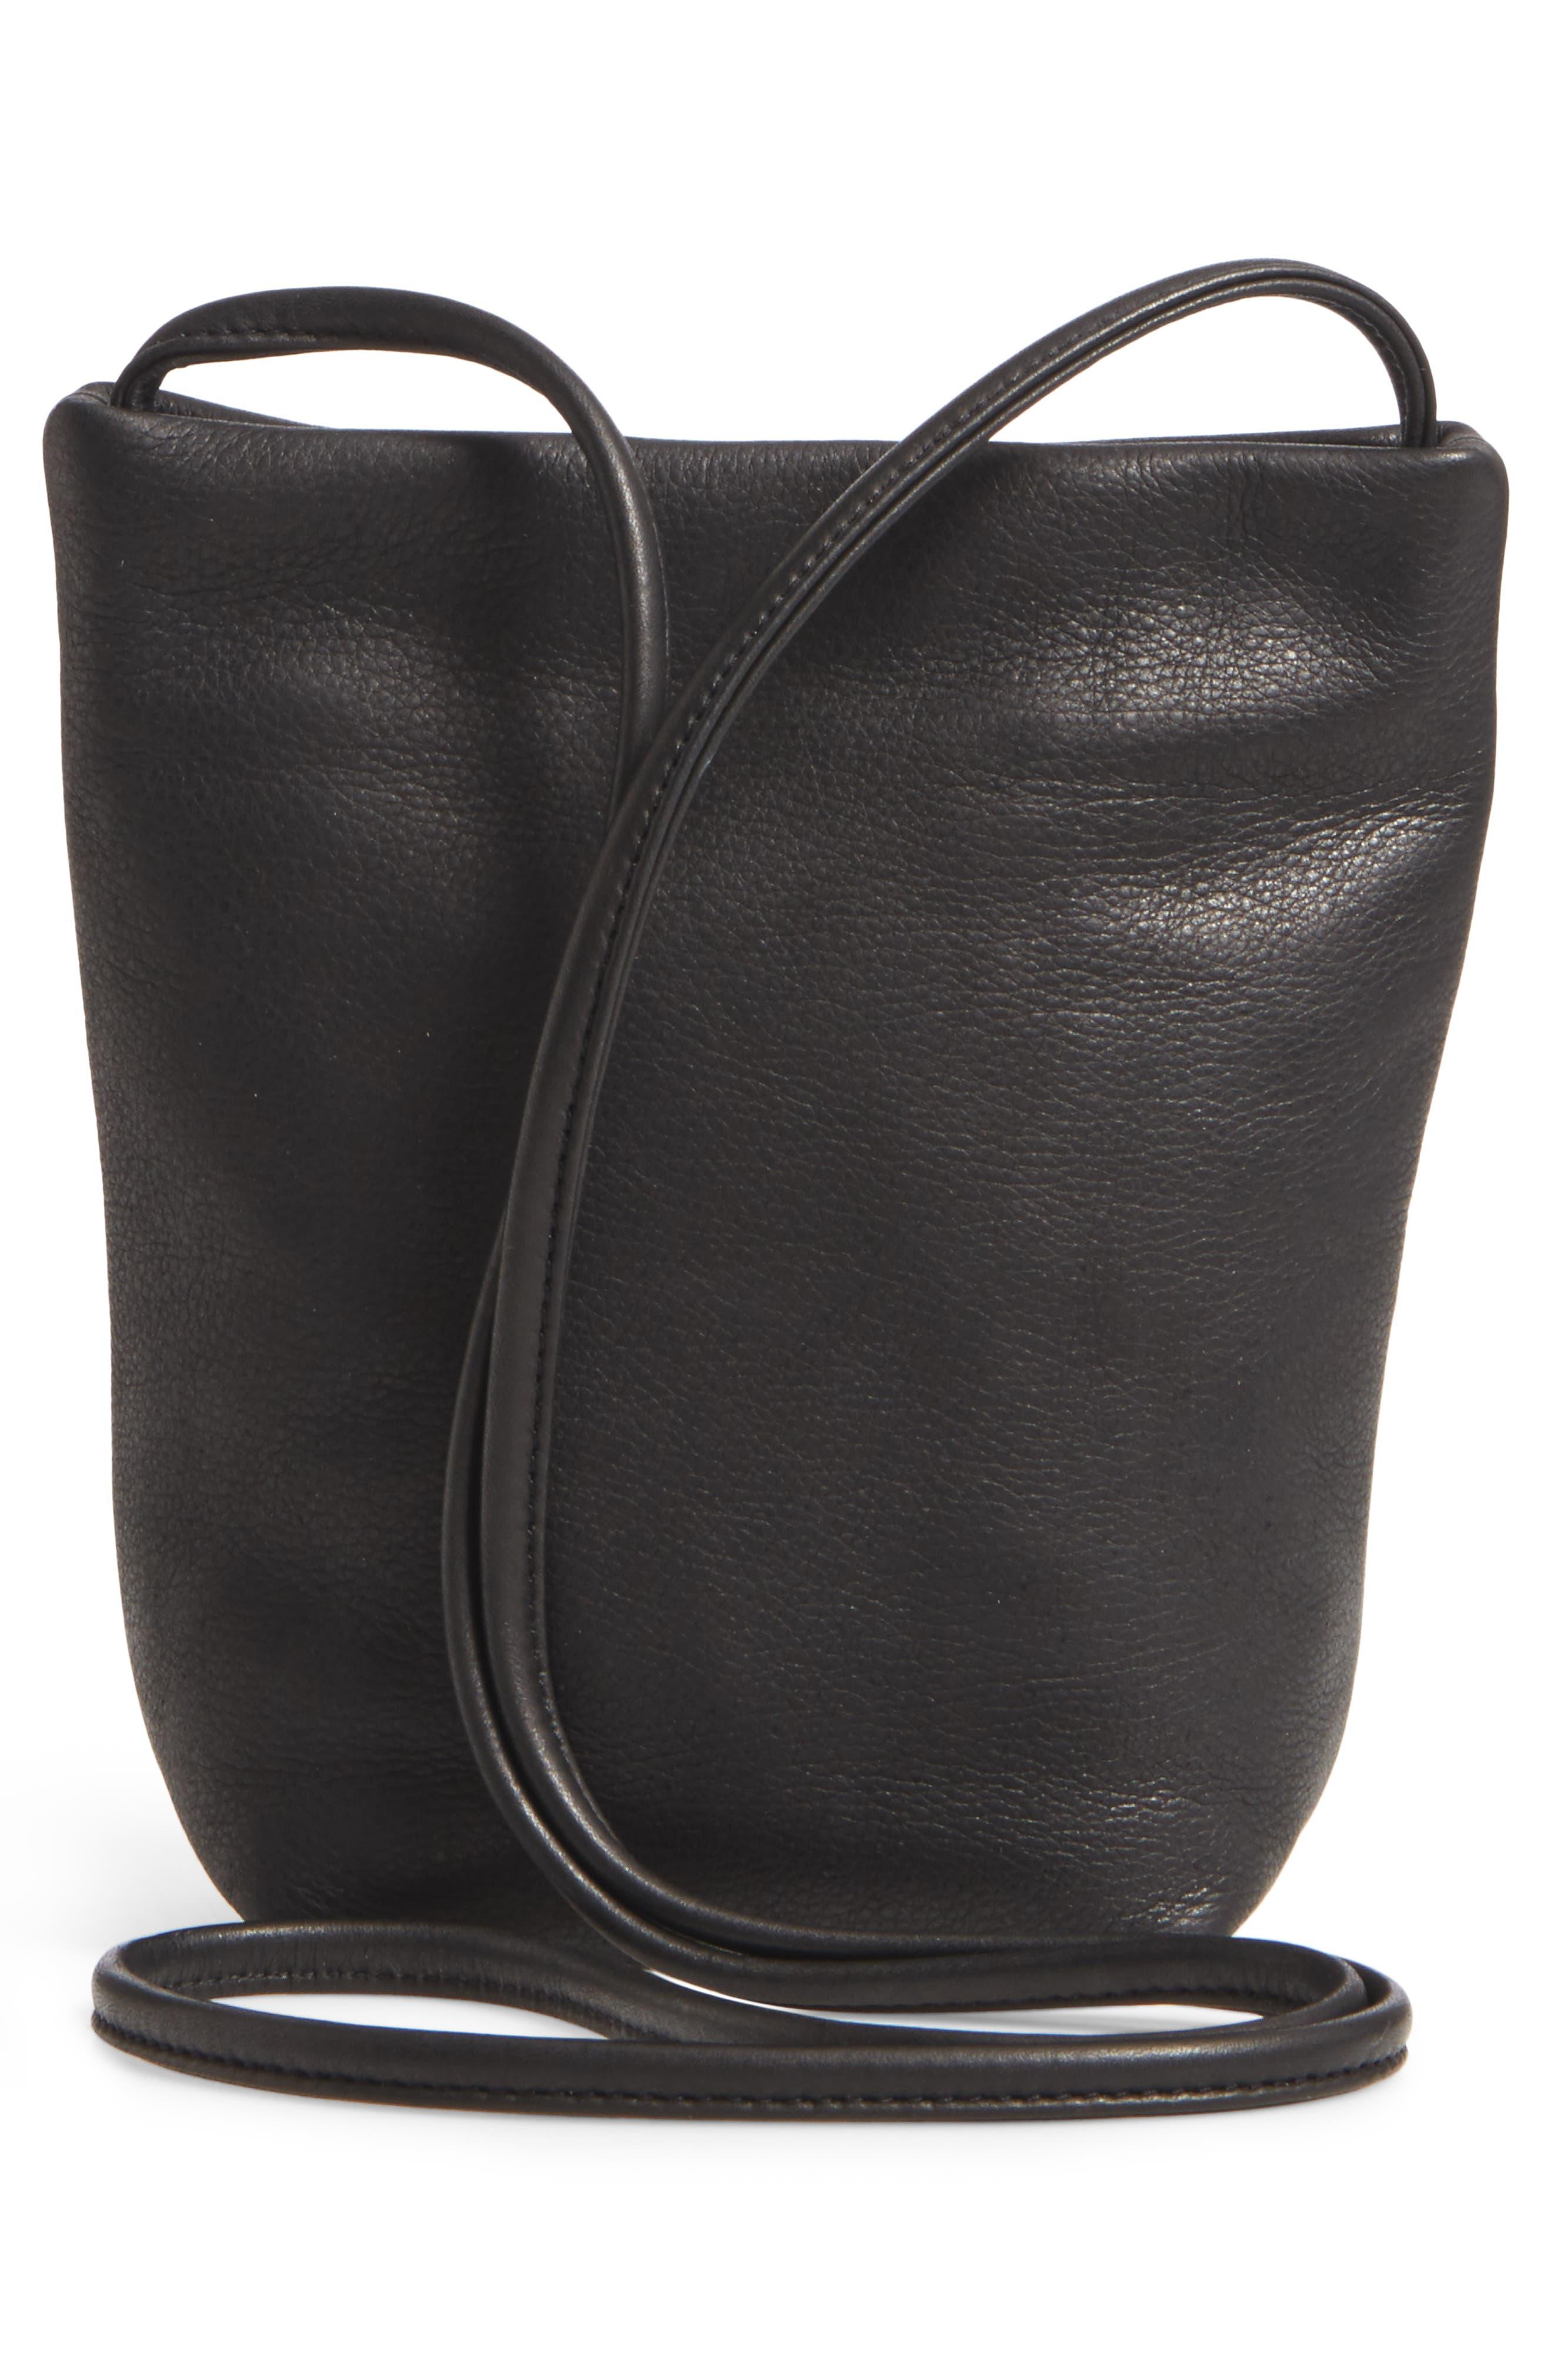 Leather Crossbody Bag,                             Alternate thumbnail 2, color,                             Black